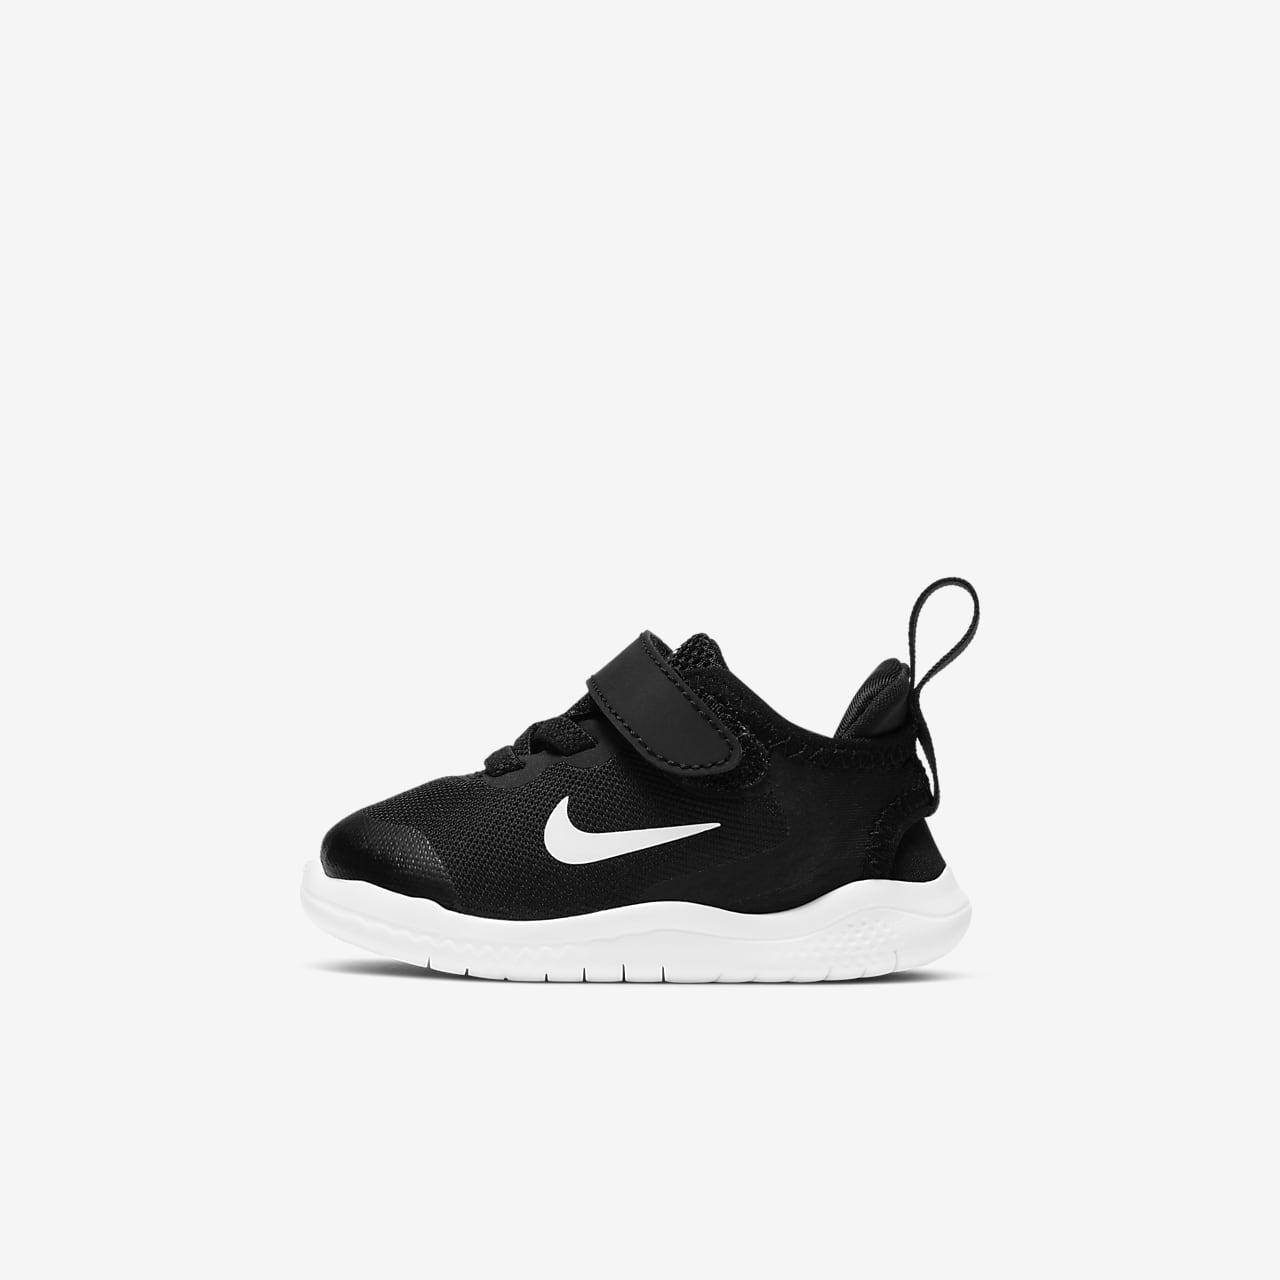 Scarpa Nike Free RN 2018 Neonati Bimbi piccoli. Nike Nike piccoli.  CH 0ffff5